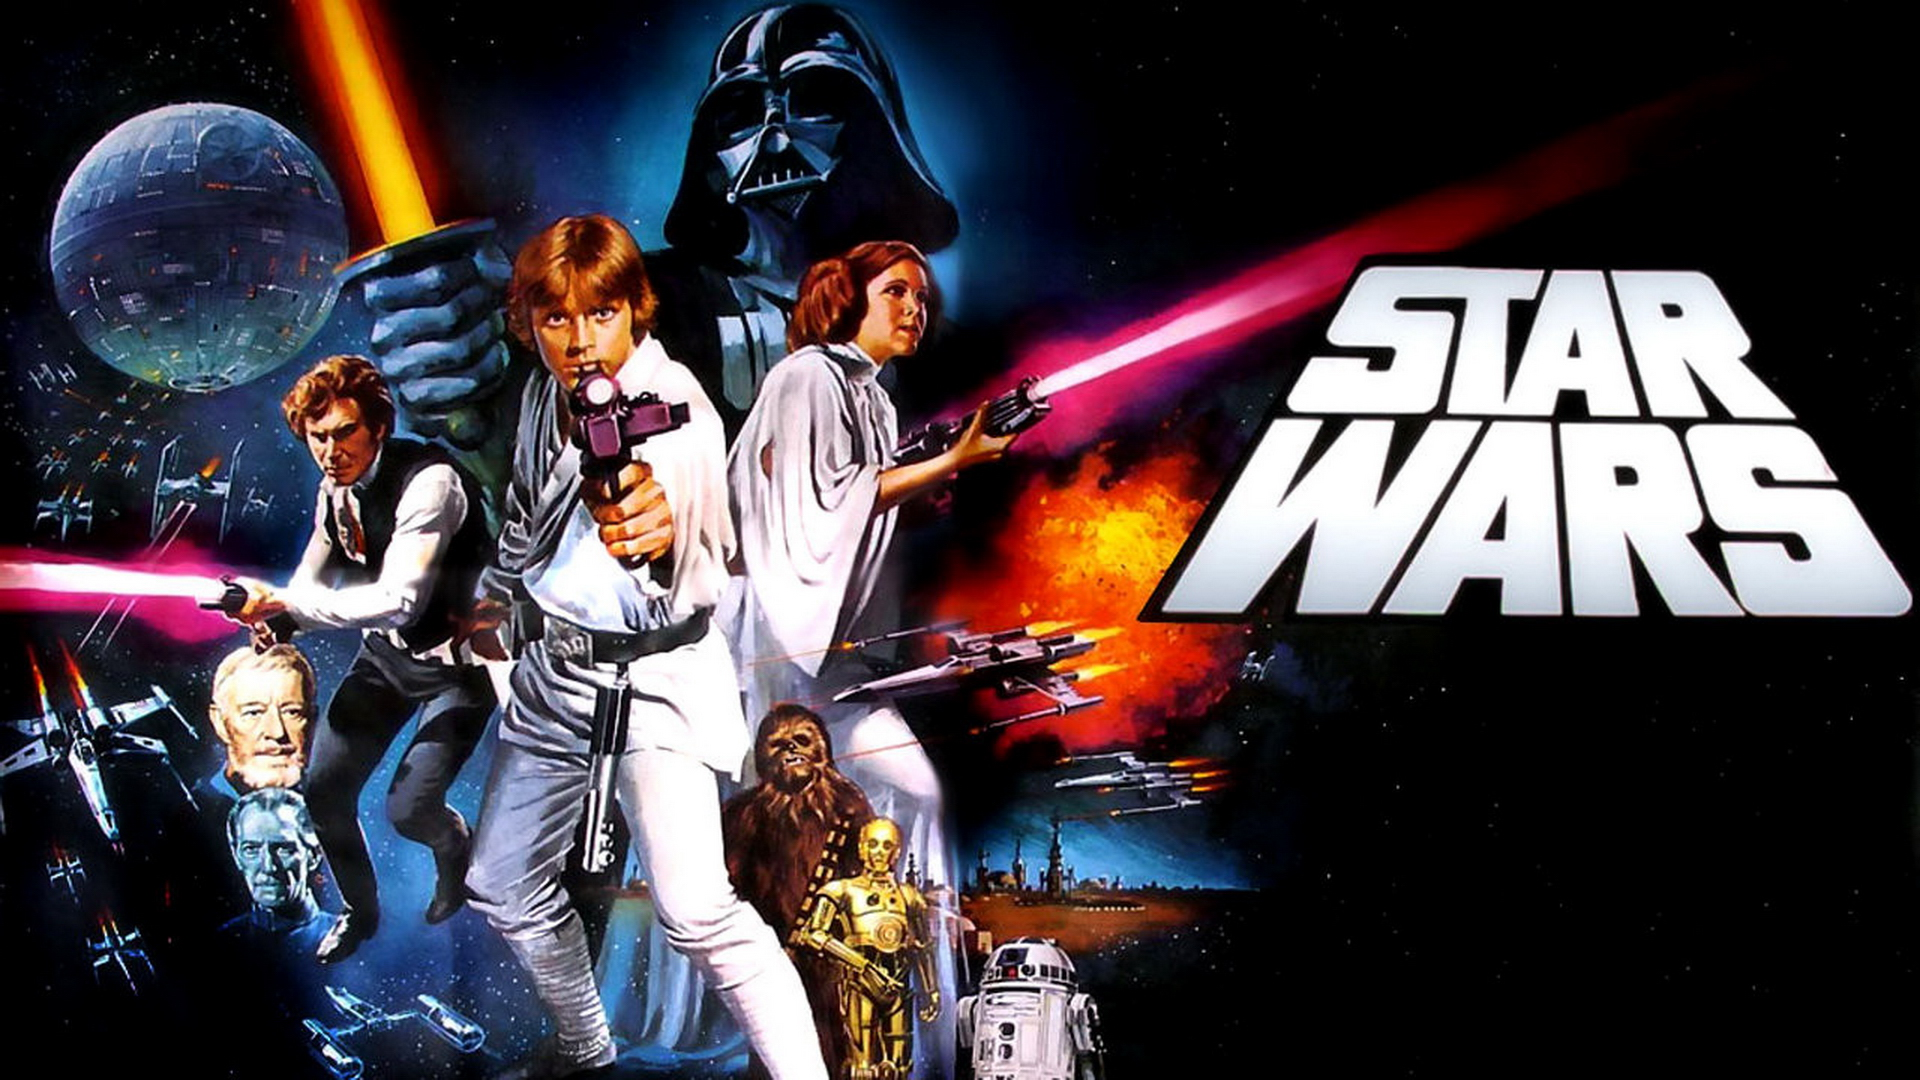 Star Wars Wallpaper Hd 33 Wallpapers Adorable Wallpapers